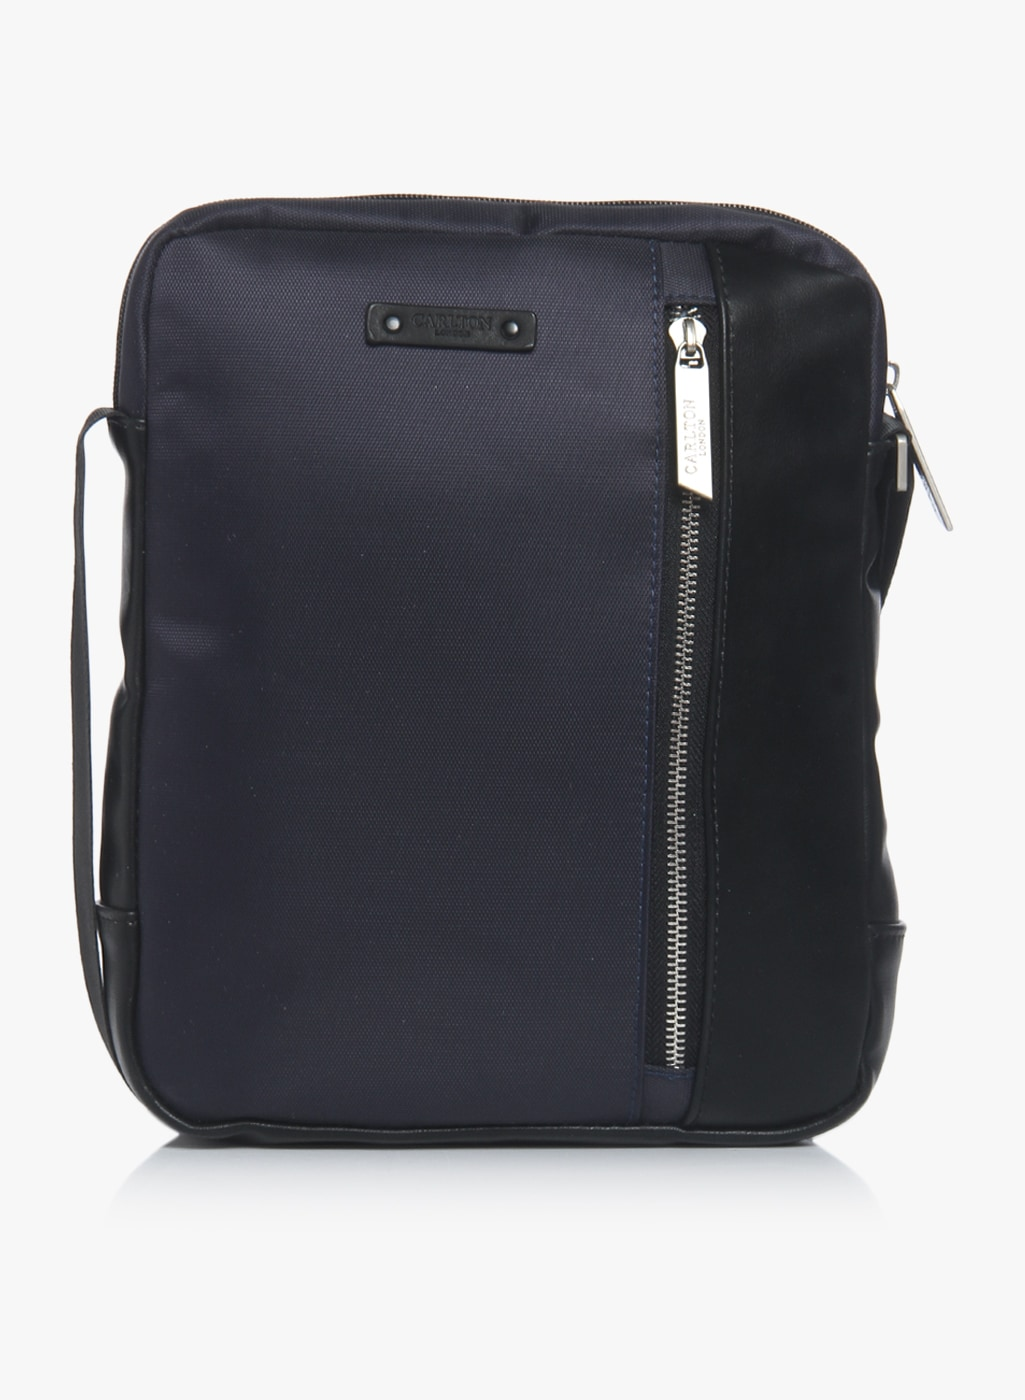 Men Fashion Store - Buy Men Clothing 5a3755858c452